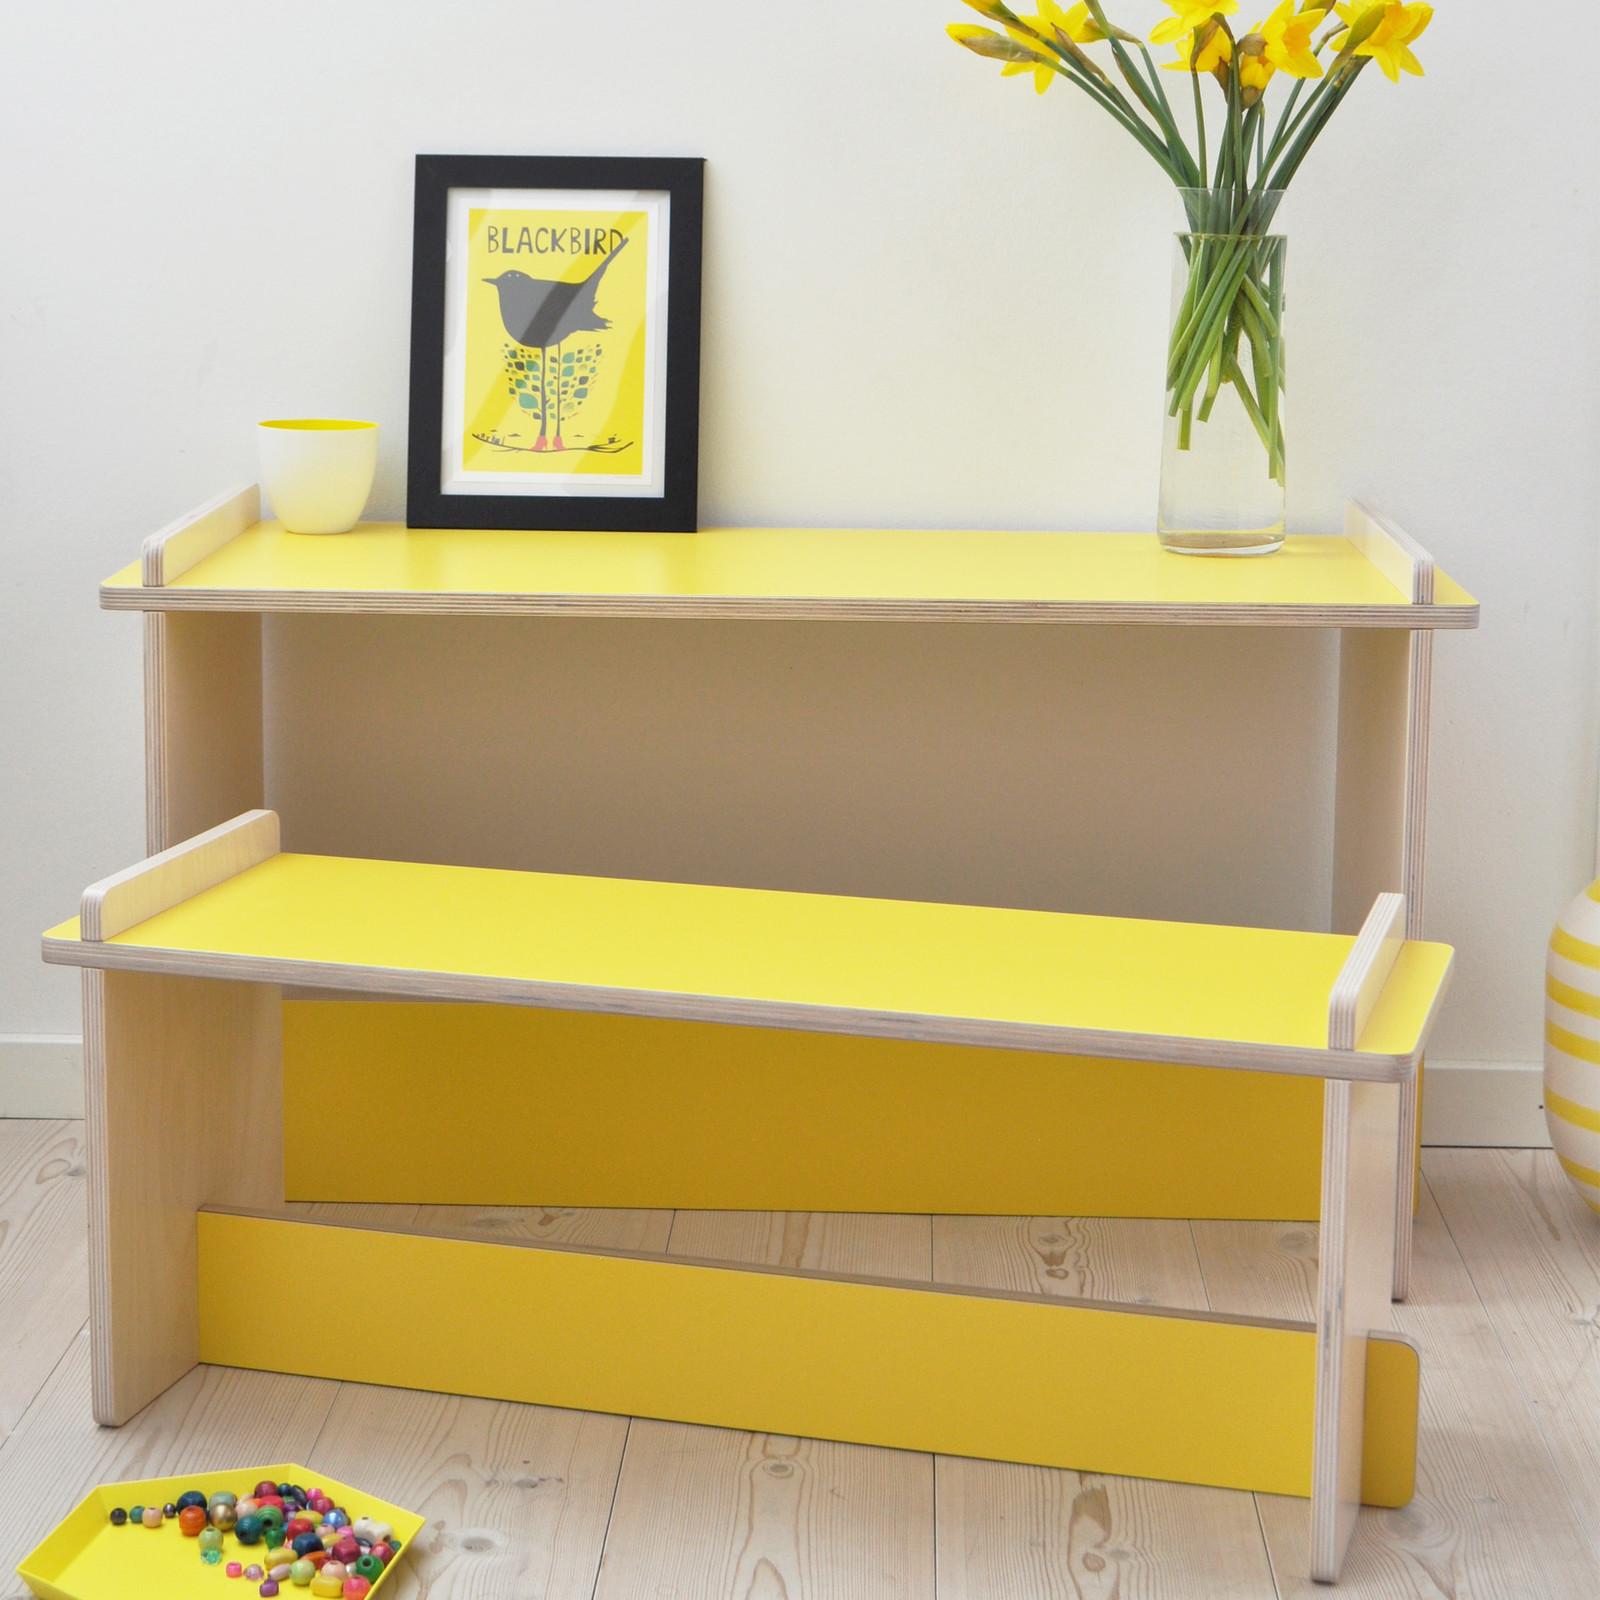 Modern yellow children's desk and bench